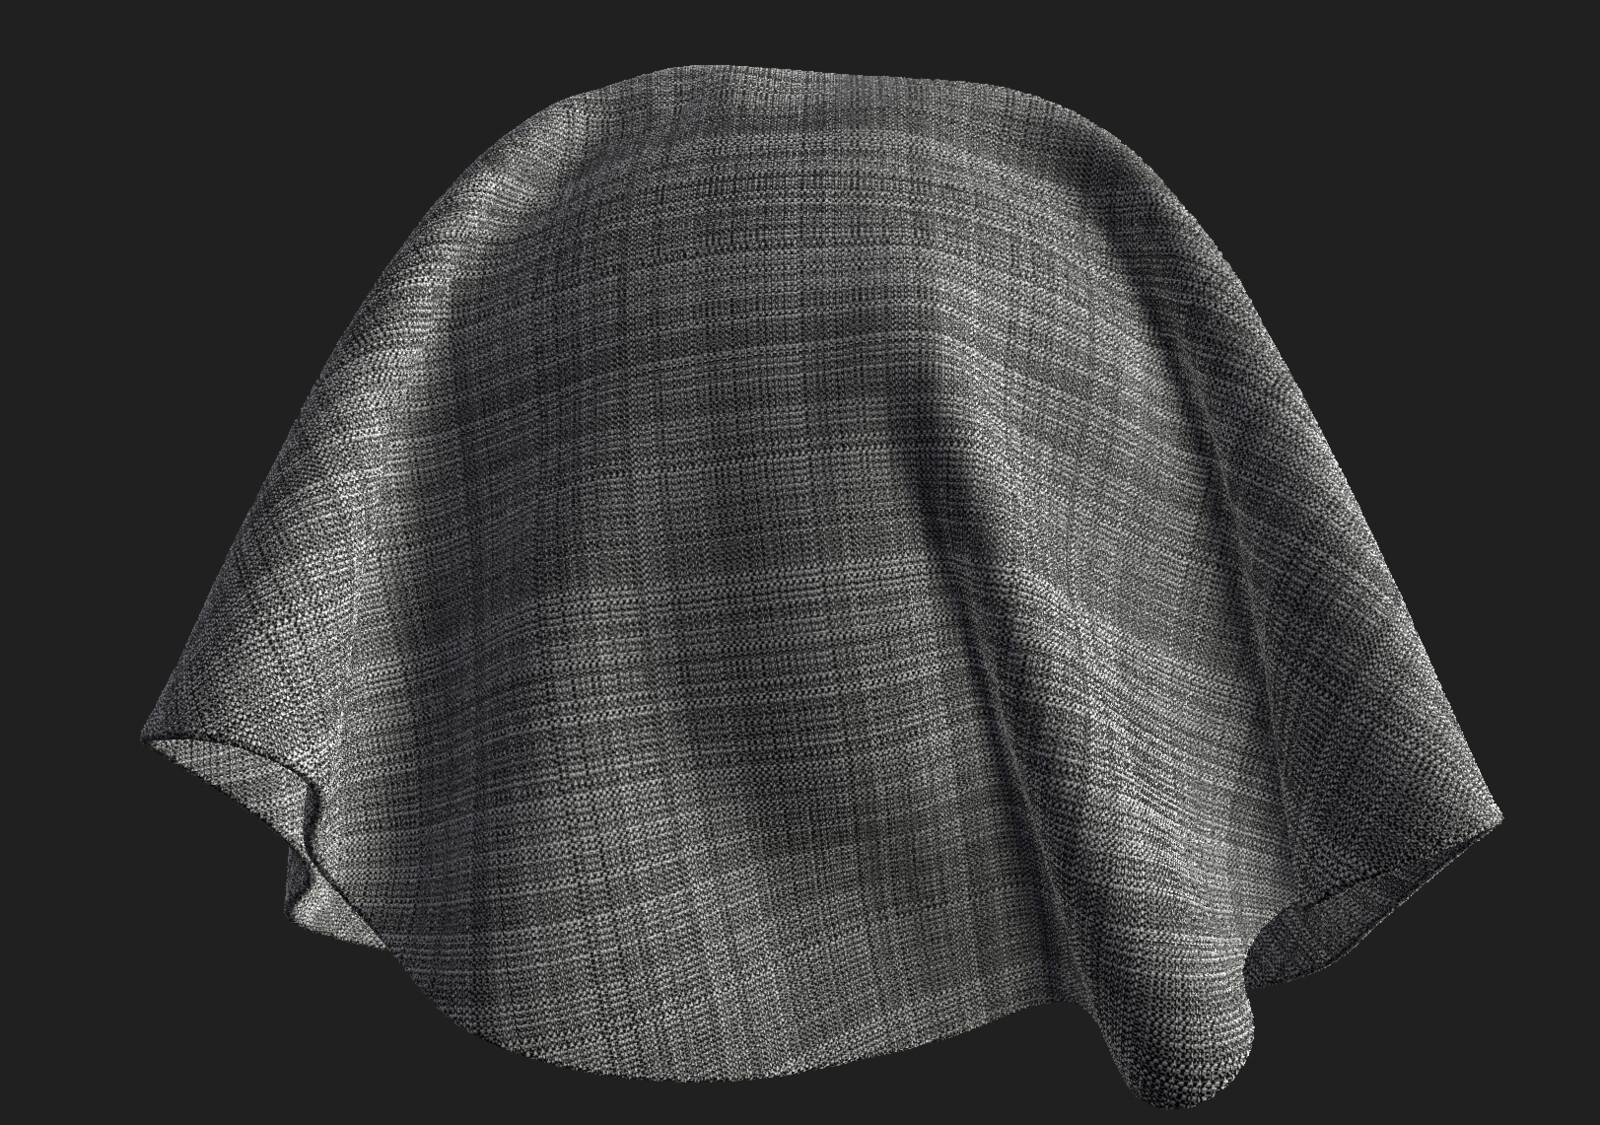 Procedural Fabric #1